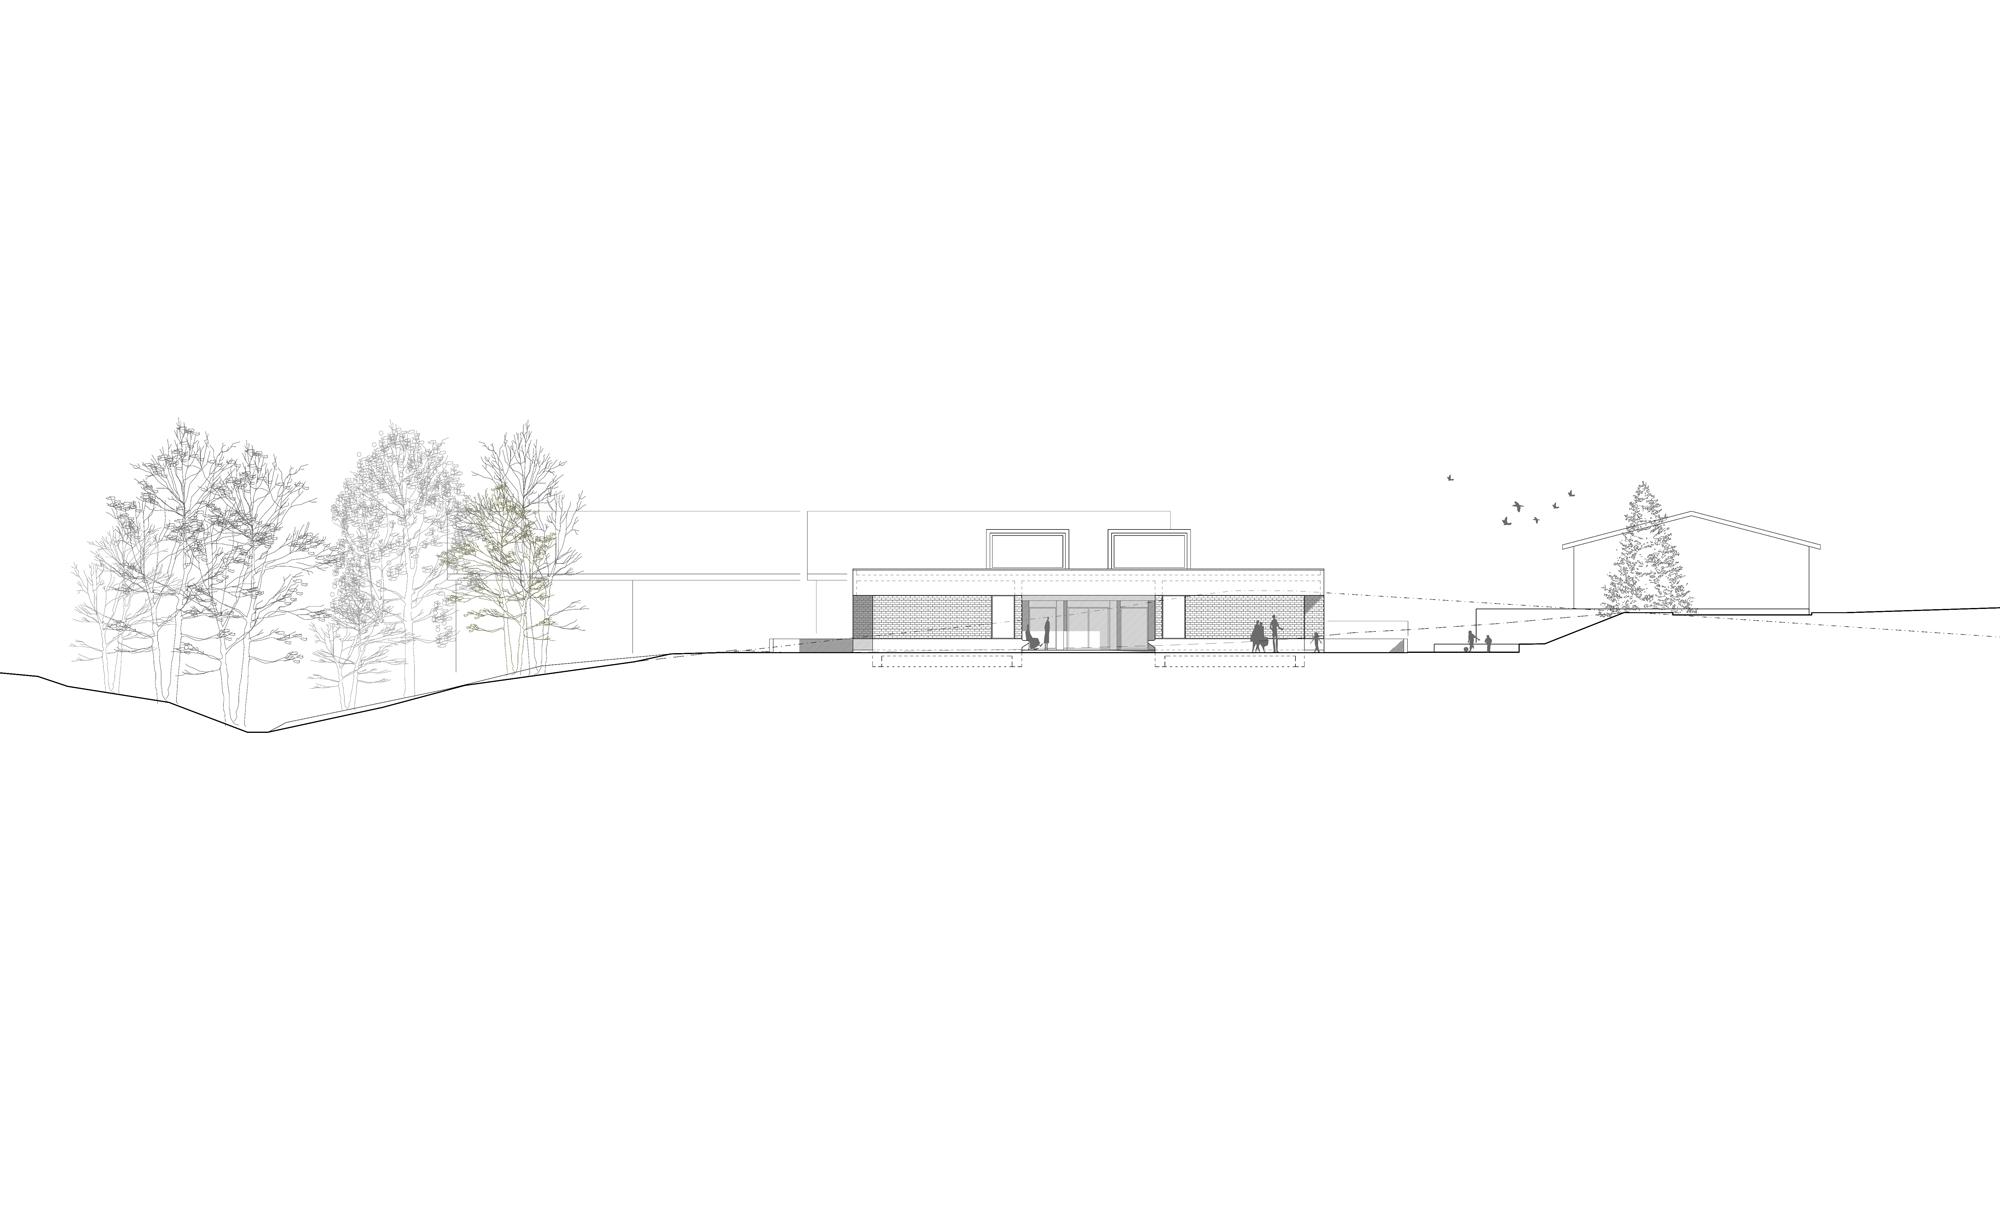 402-Süd--Westfassade-Neubau-Kiga-Neuenkirch-1_200_web.png